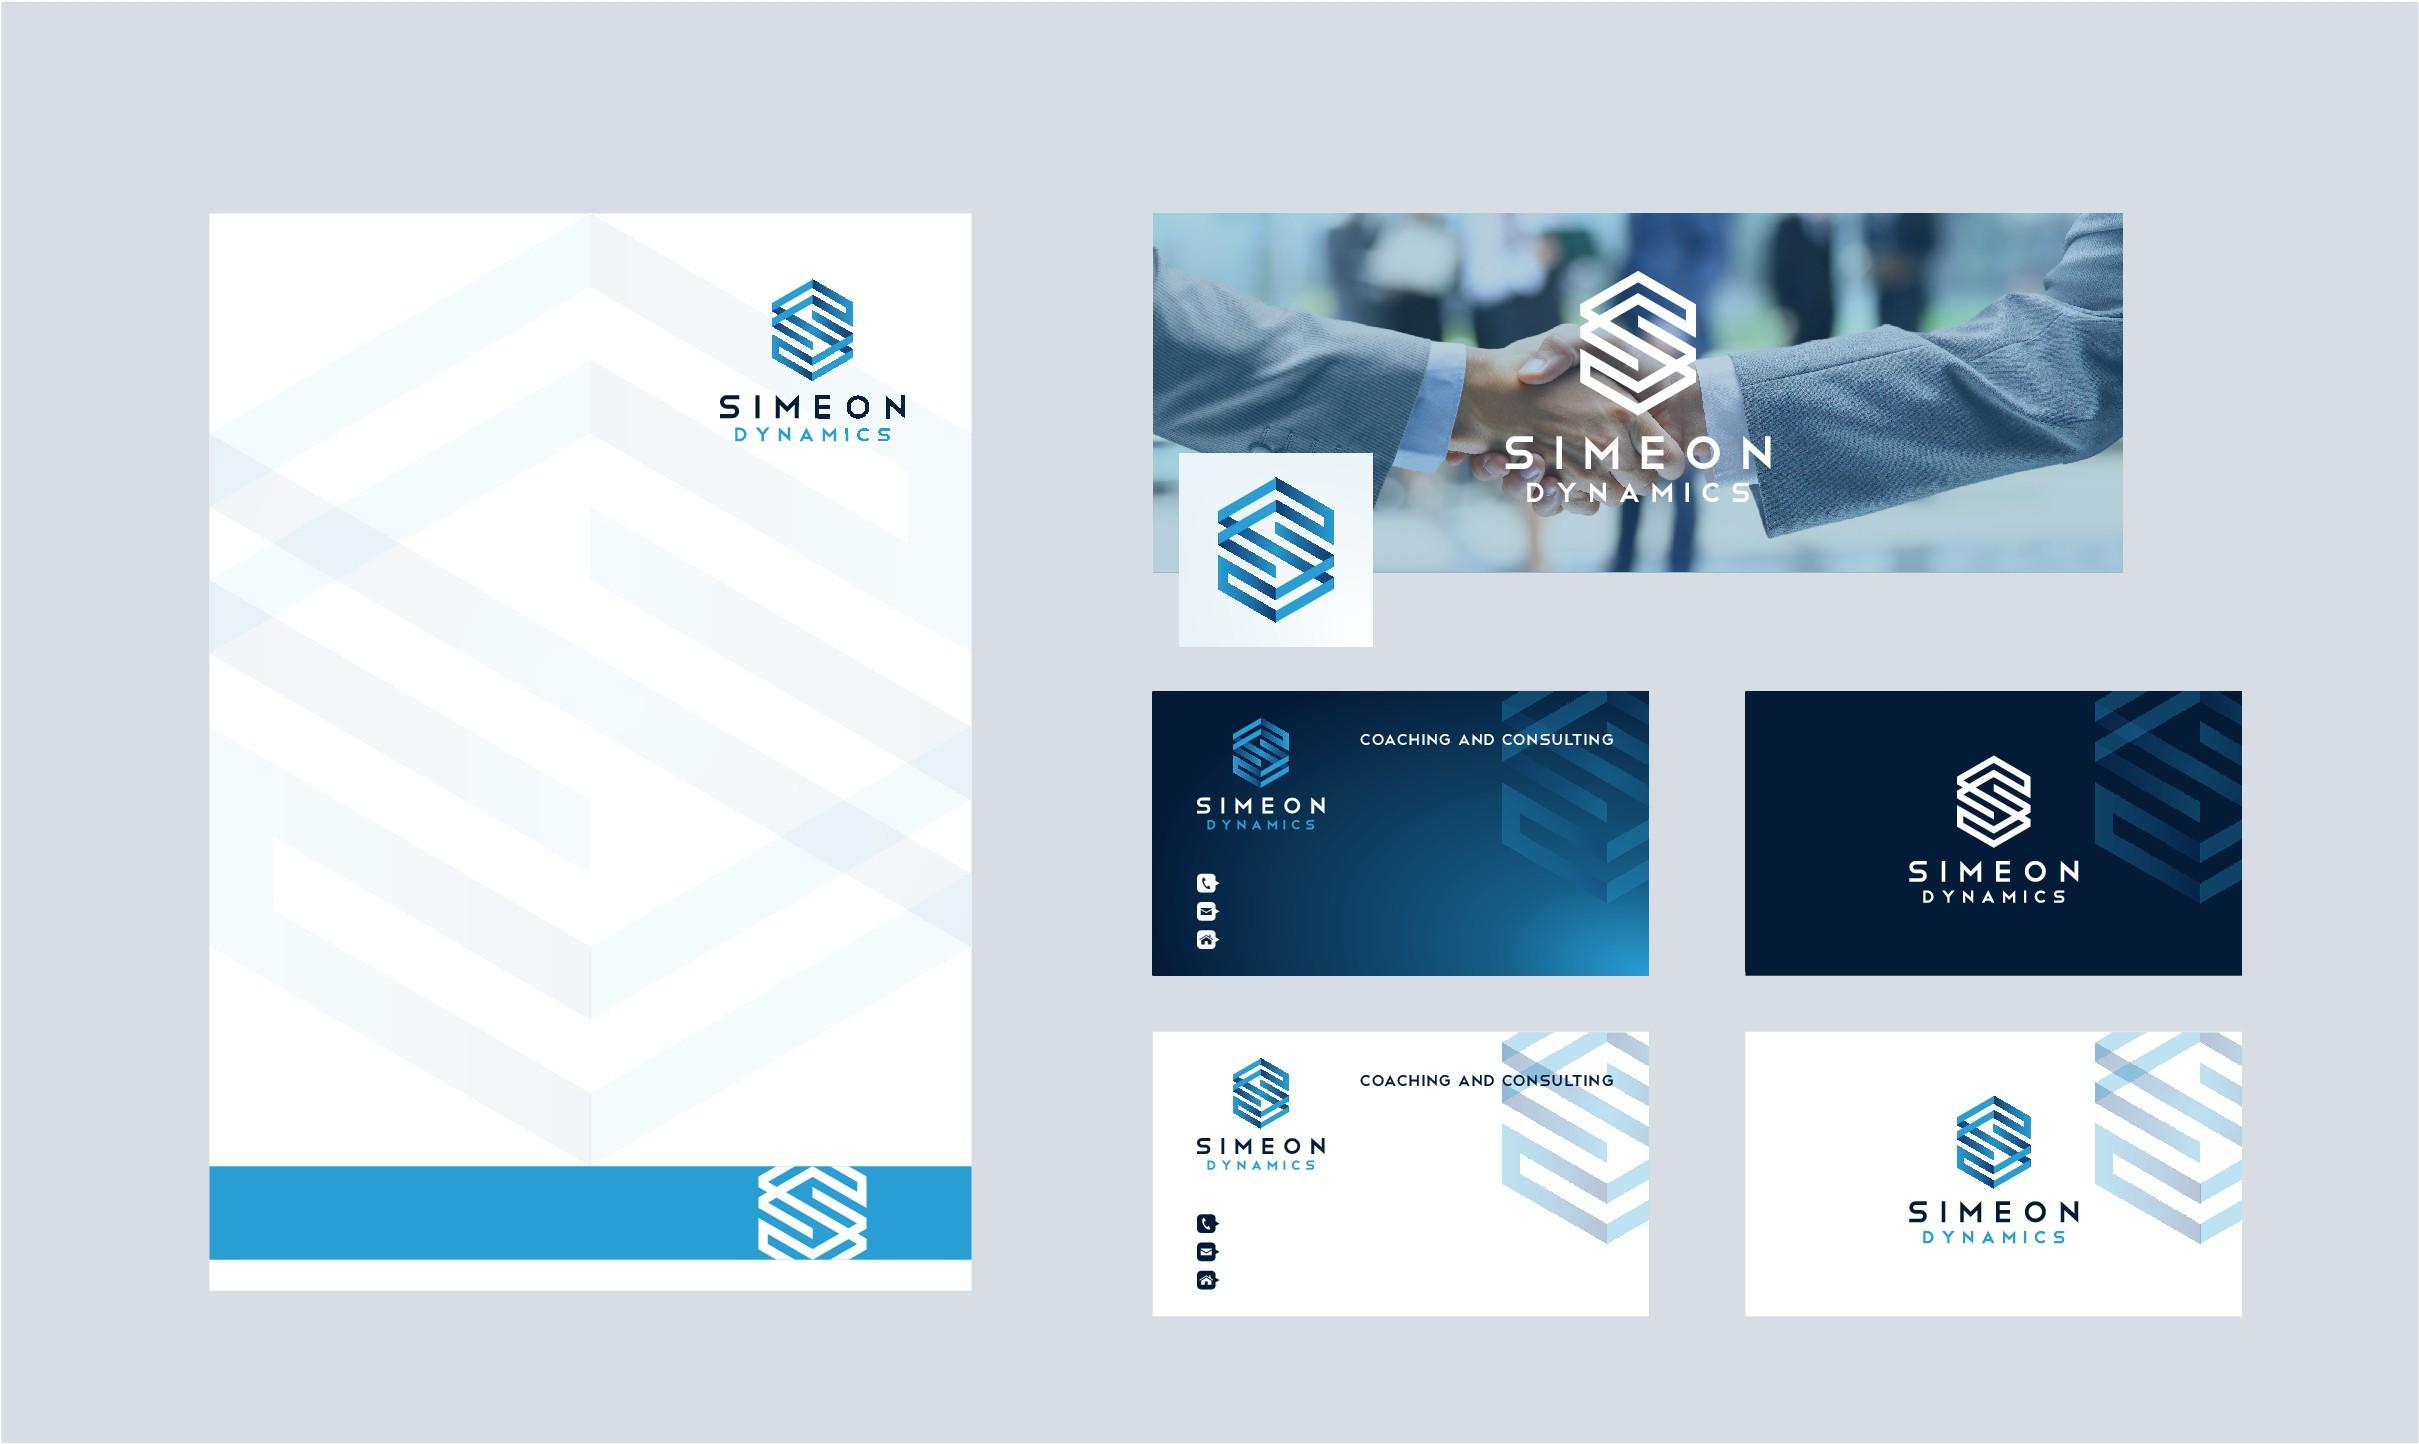 Business card, facebook cover, letterhead